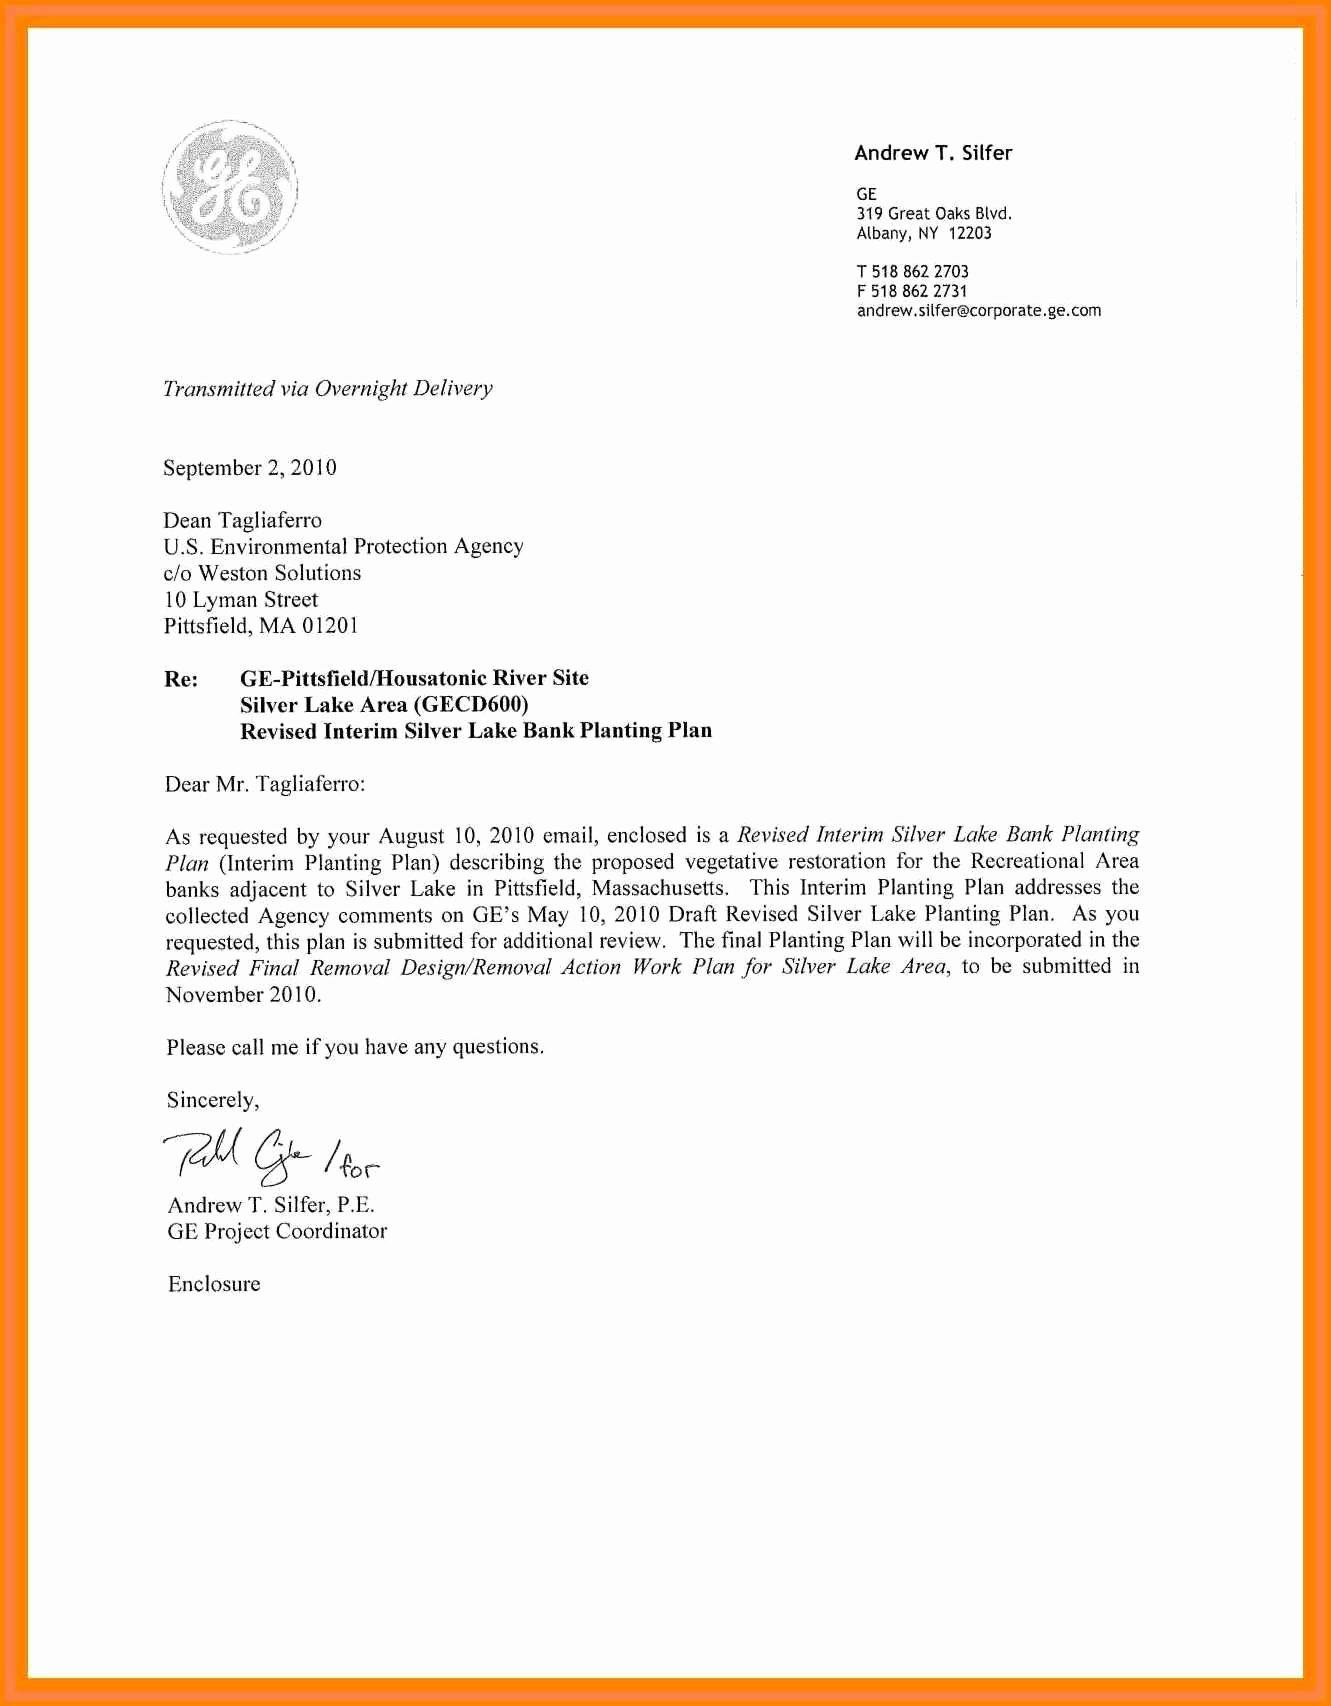 Business Letter Enclosure format Fresh Business Letter Enclosure format Block with Notation Cover